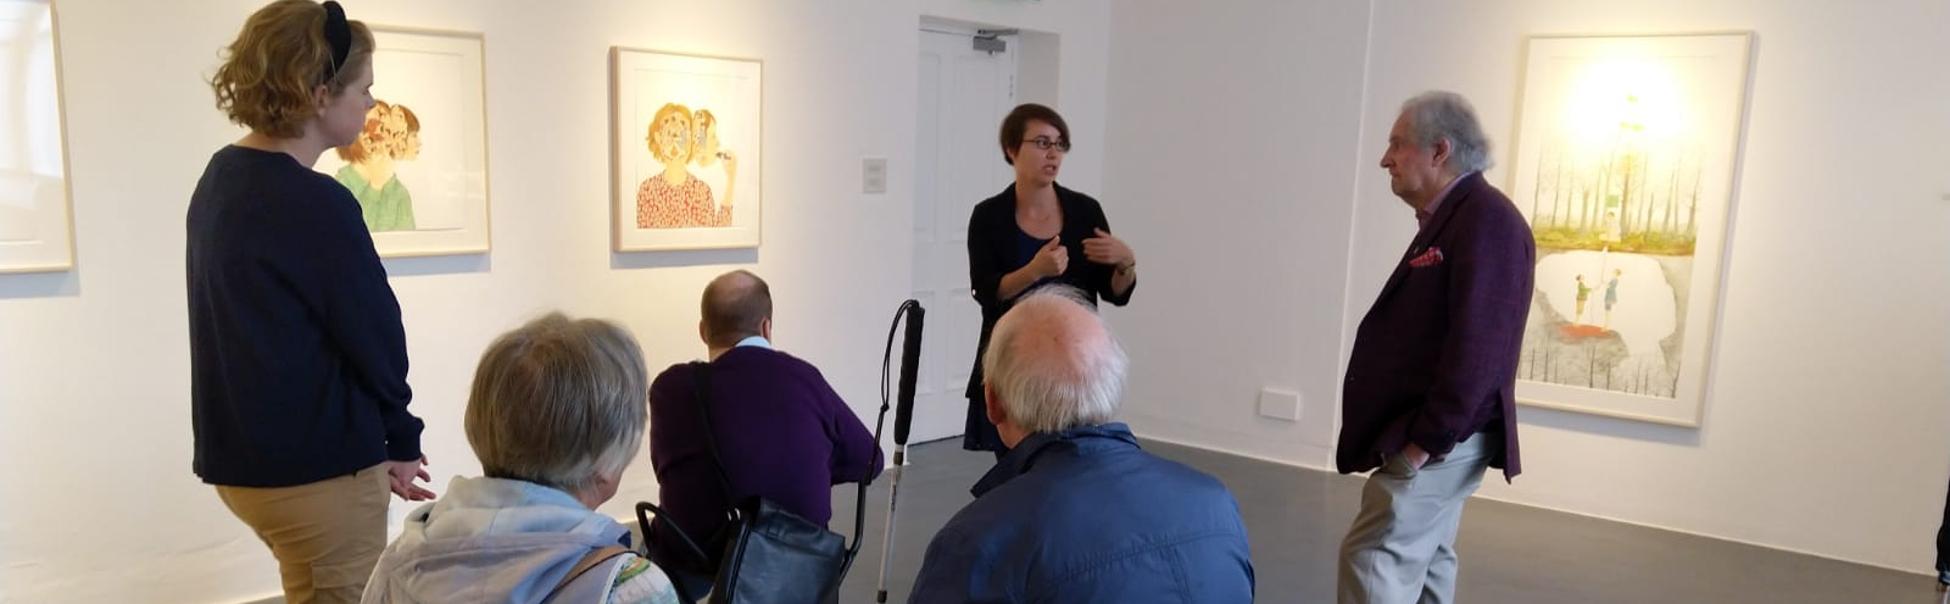 Audio-described-tour-of-Amy-Cutler-at-Butler-Gallery-